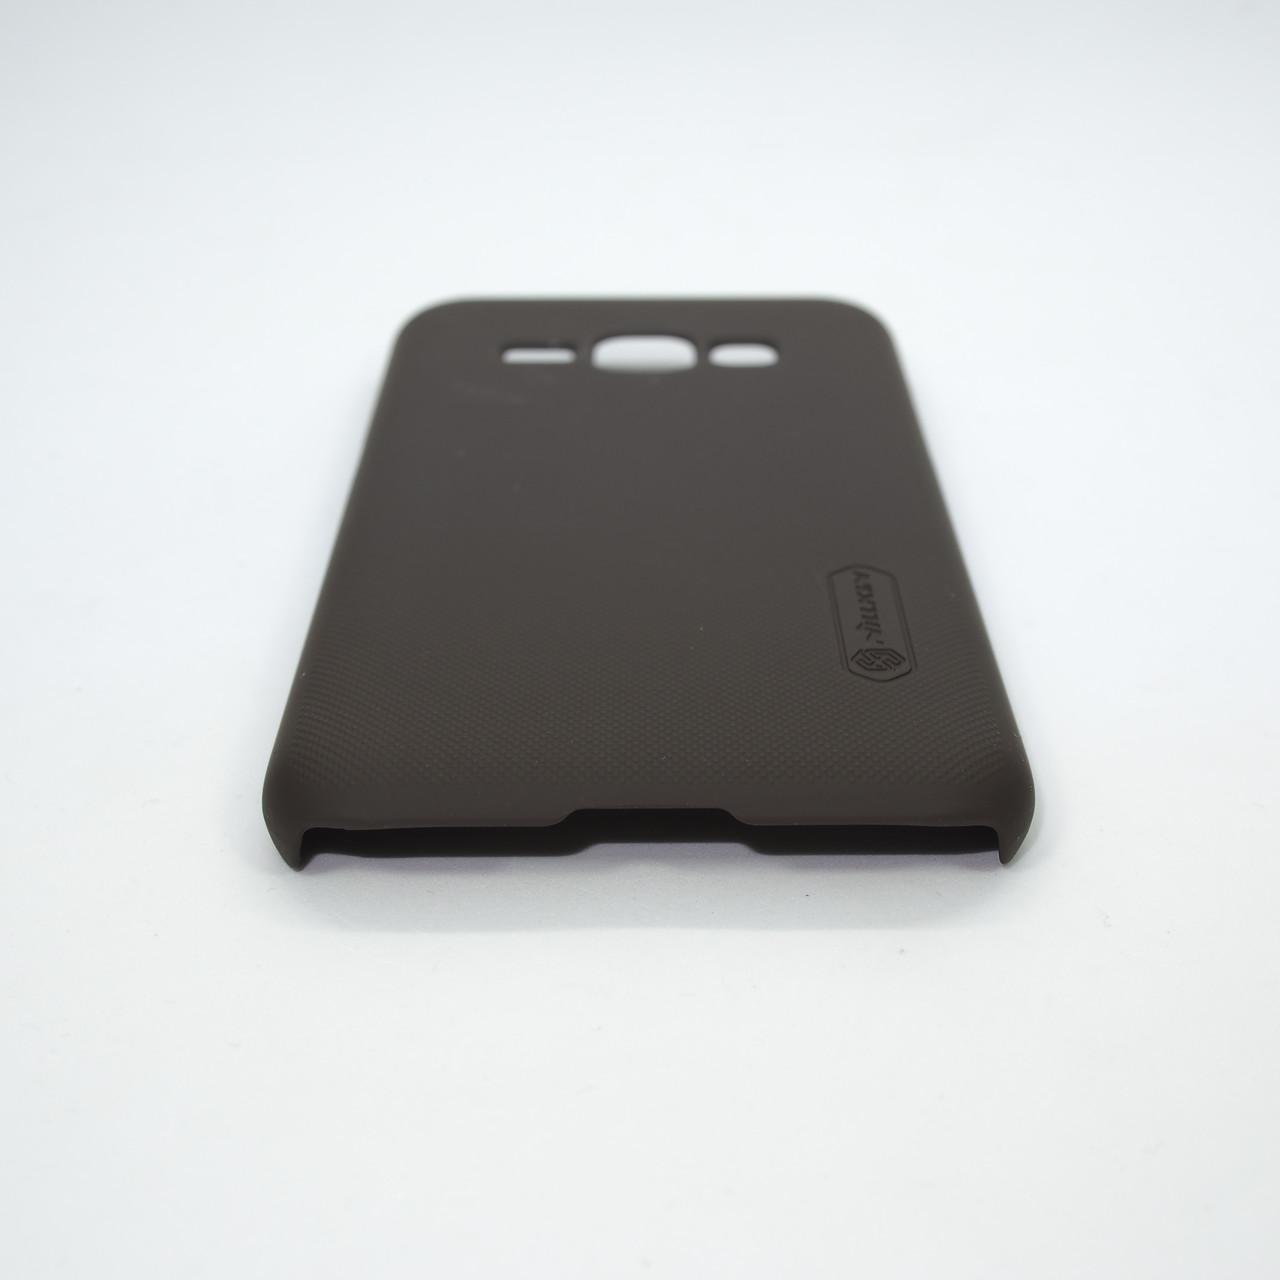 Накладка Nillkin Super Frosted Shield Samsung Galaxy J120 brown Для телефона